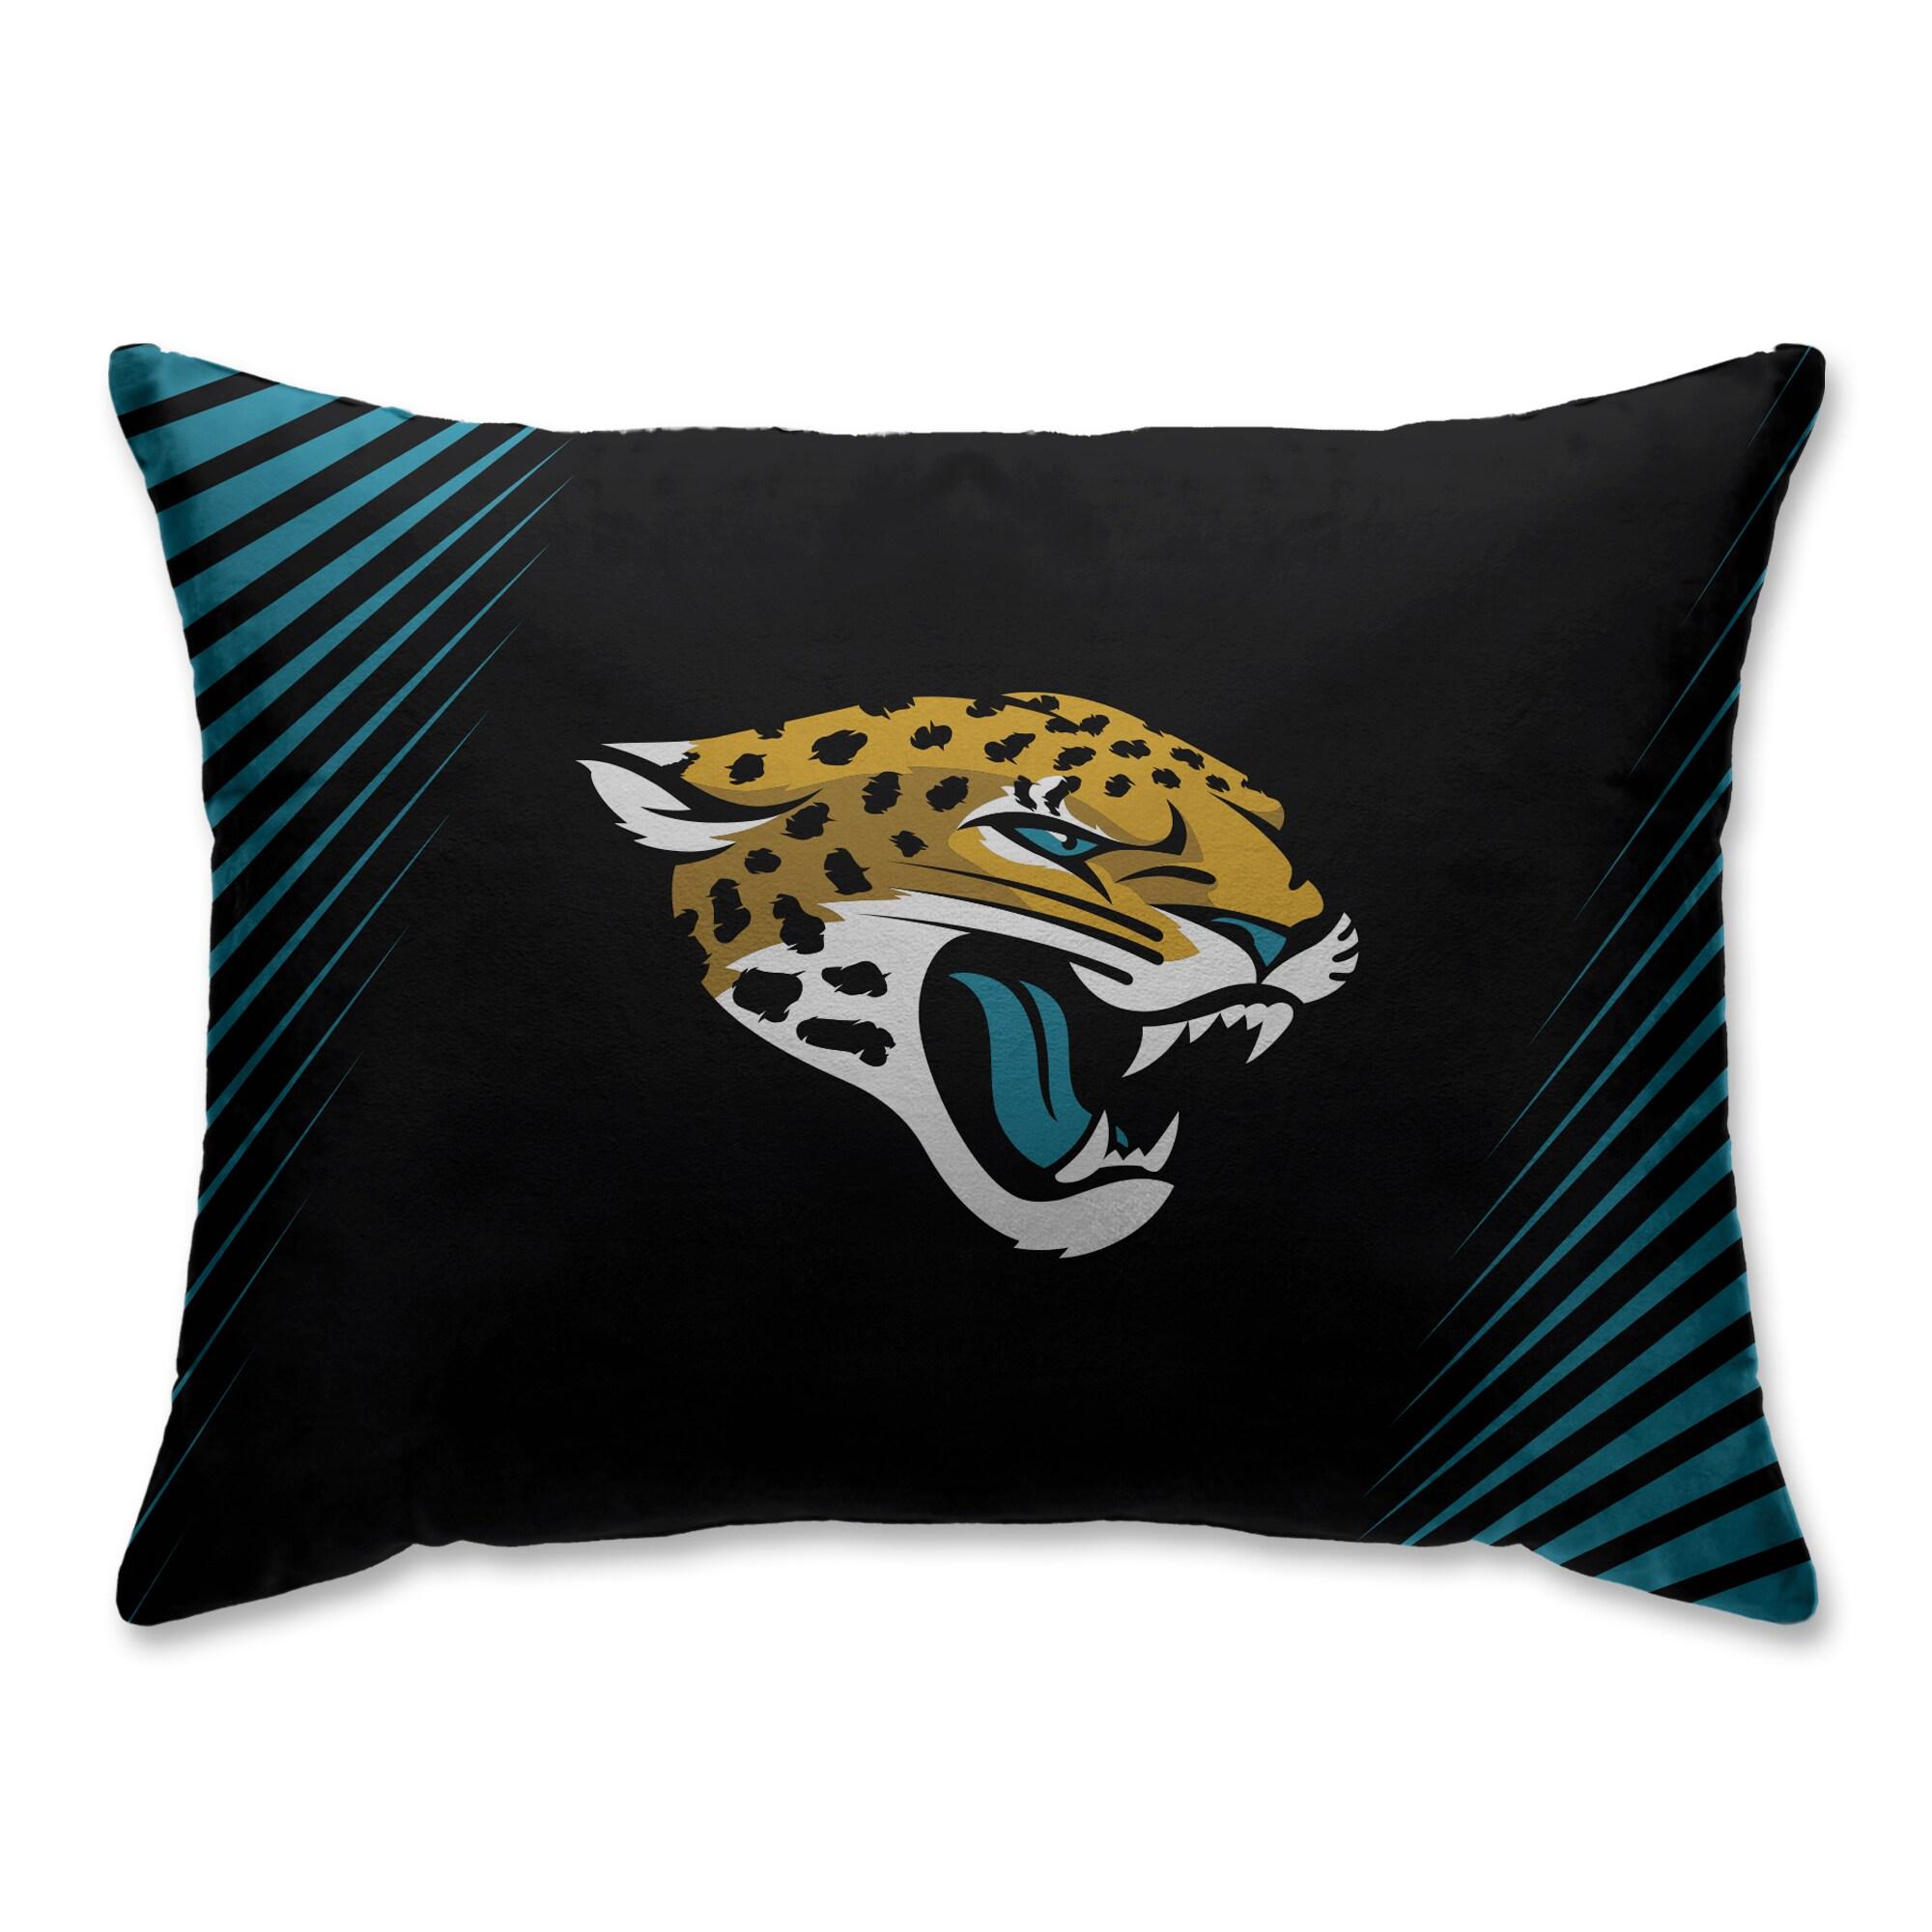 Jacksonville Jaguars Side Streak Plush Standard Pillow Protector - Teal